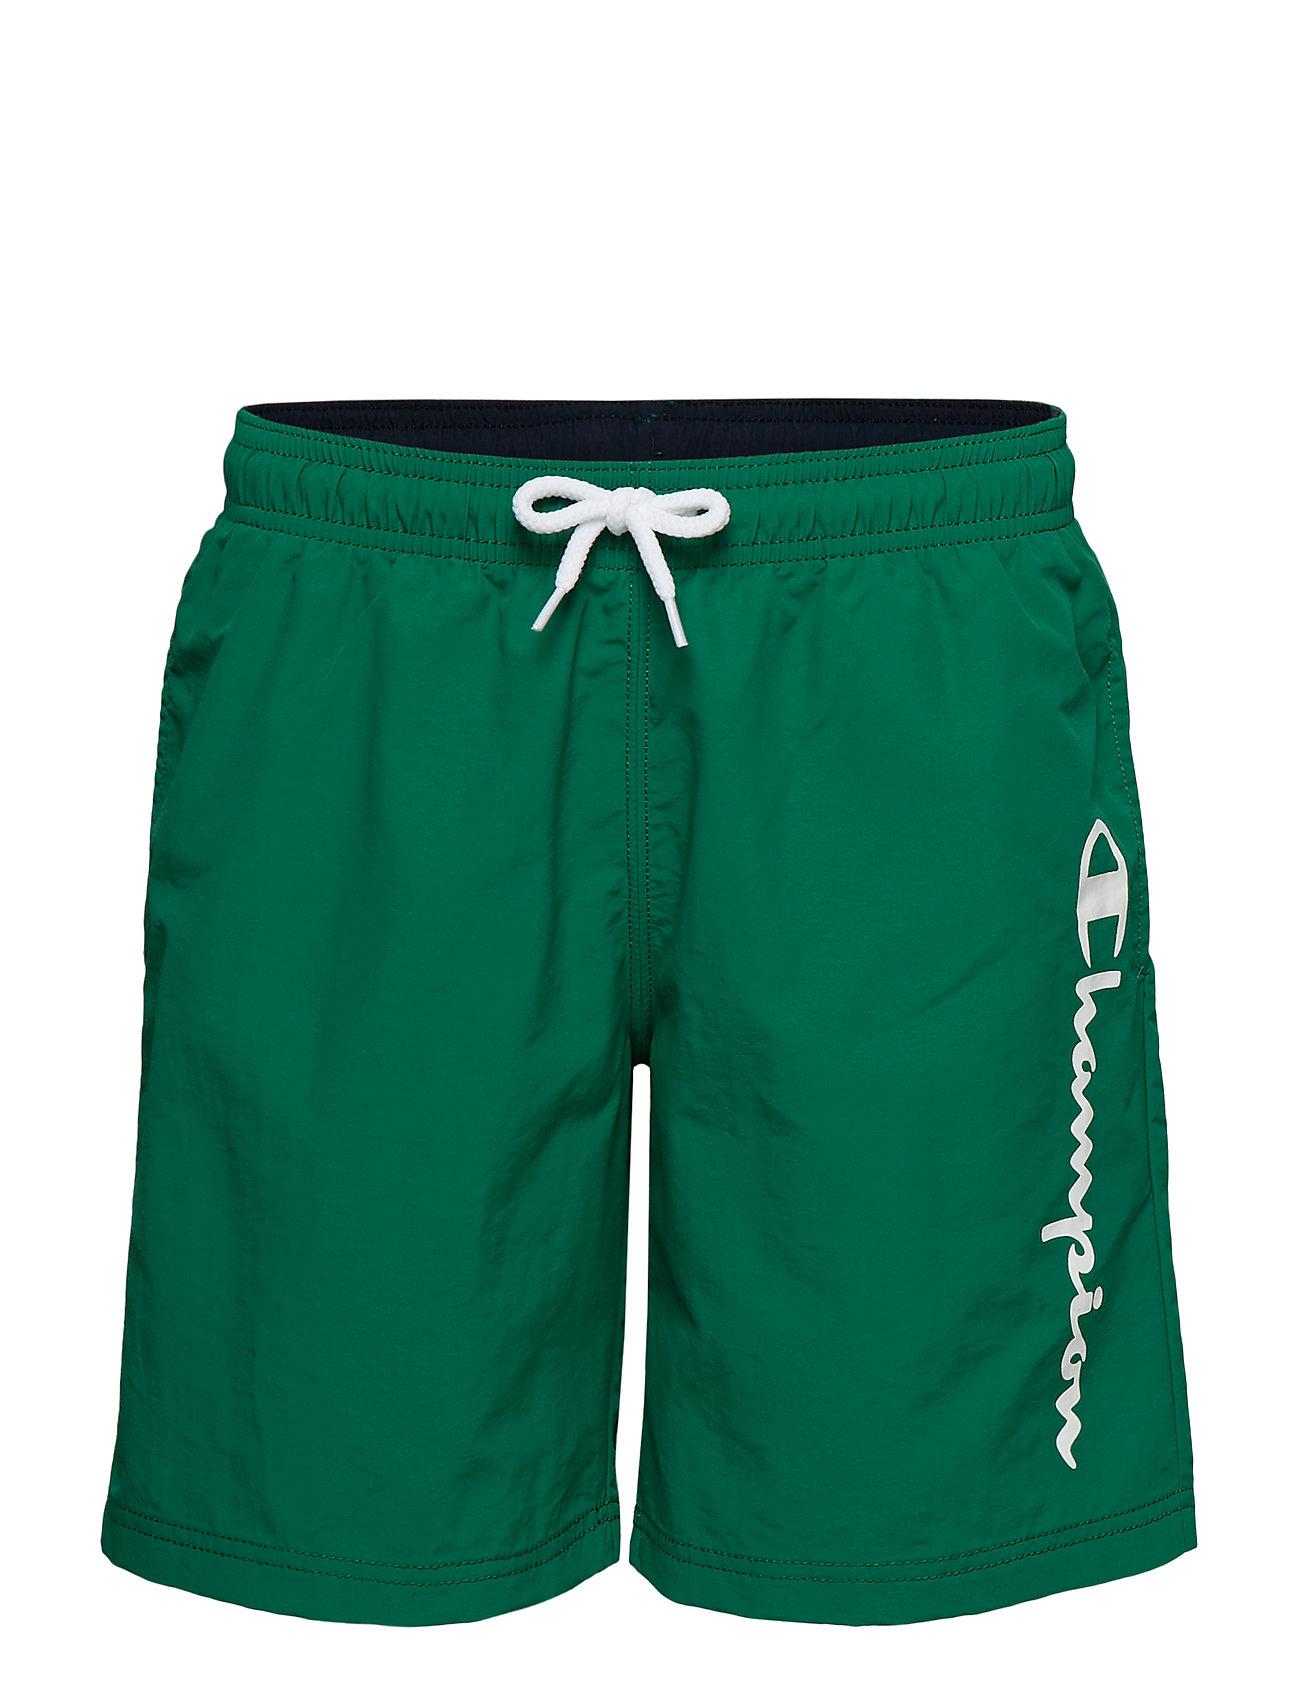 Champion Beachshort - VERDANT GREEN